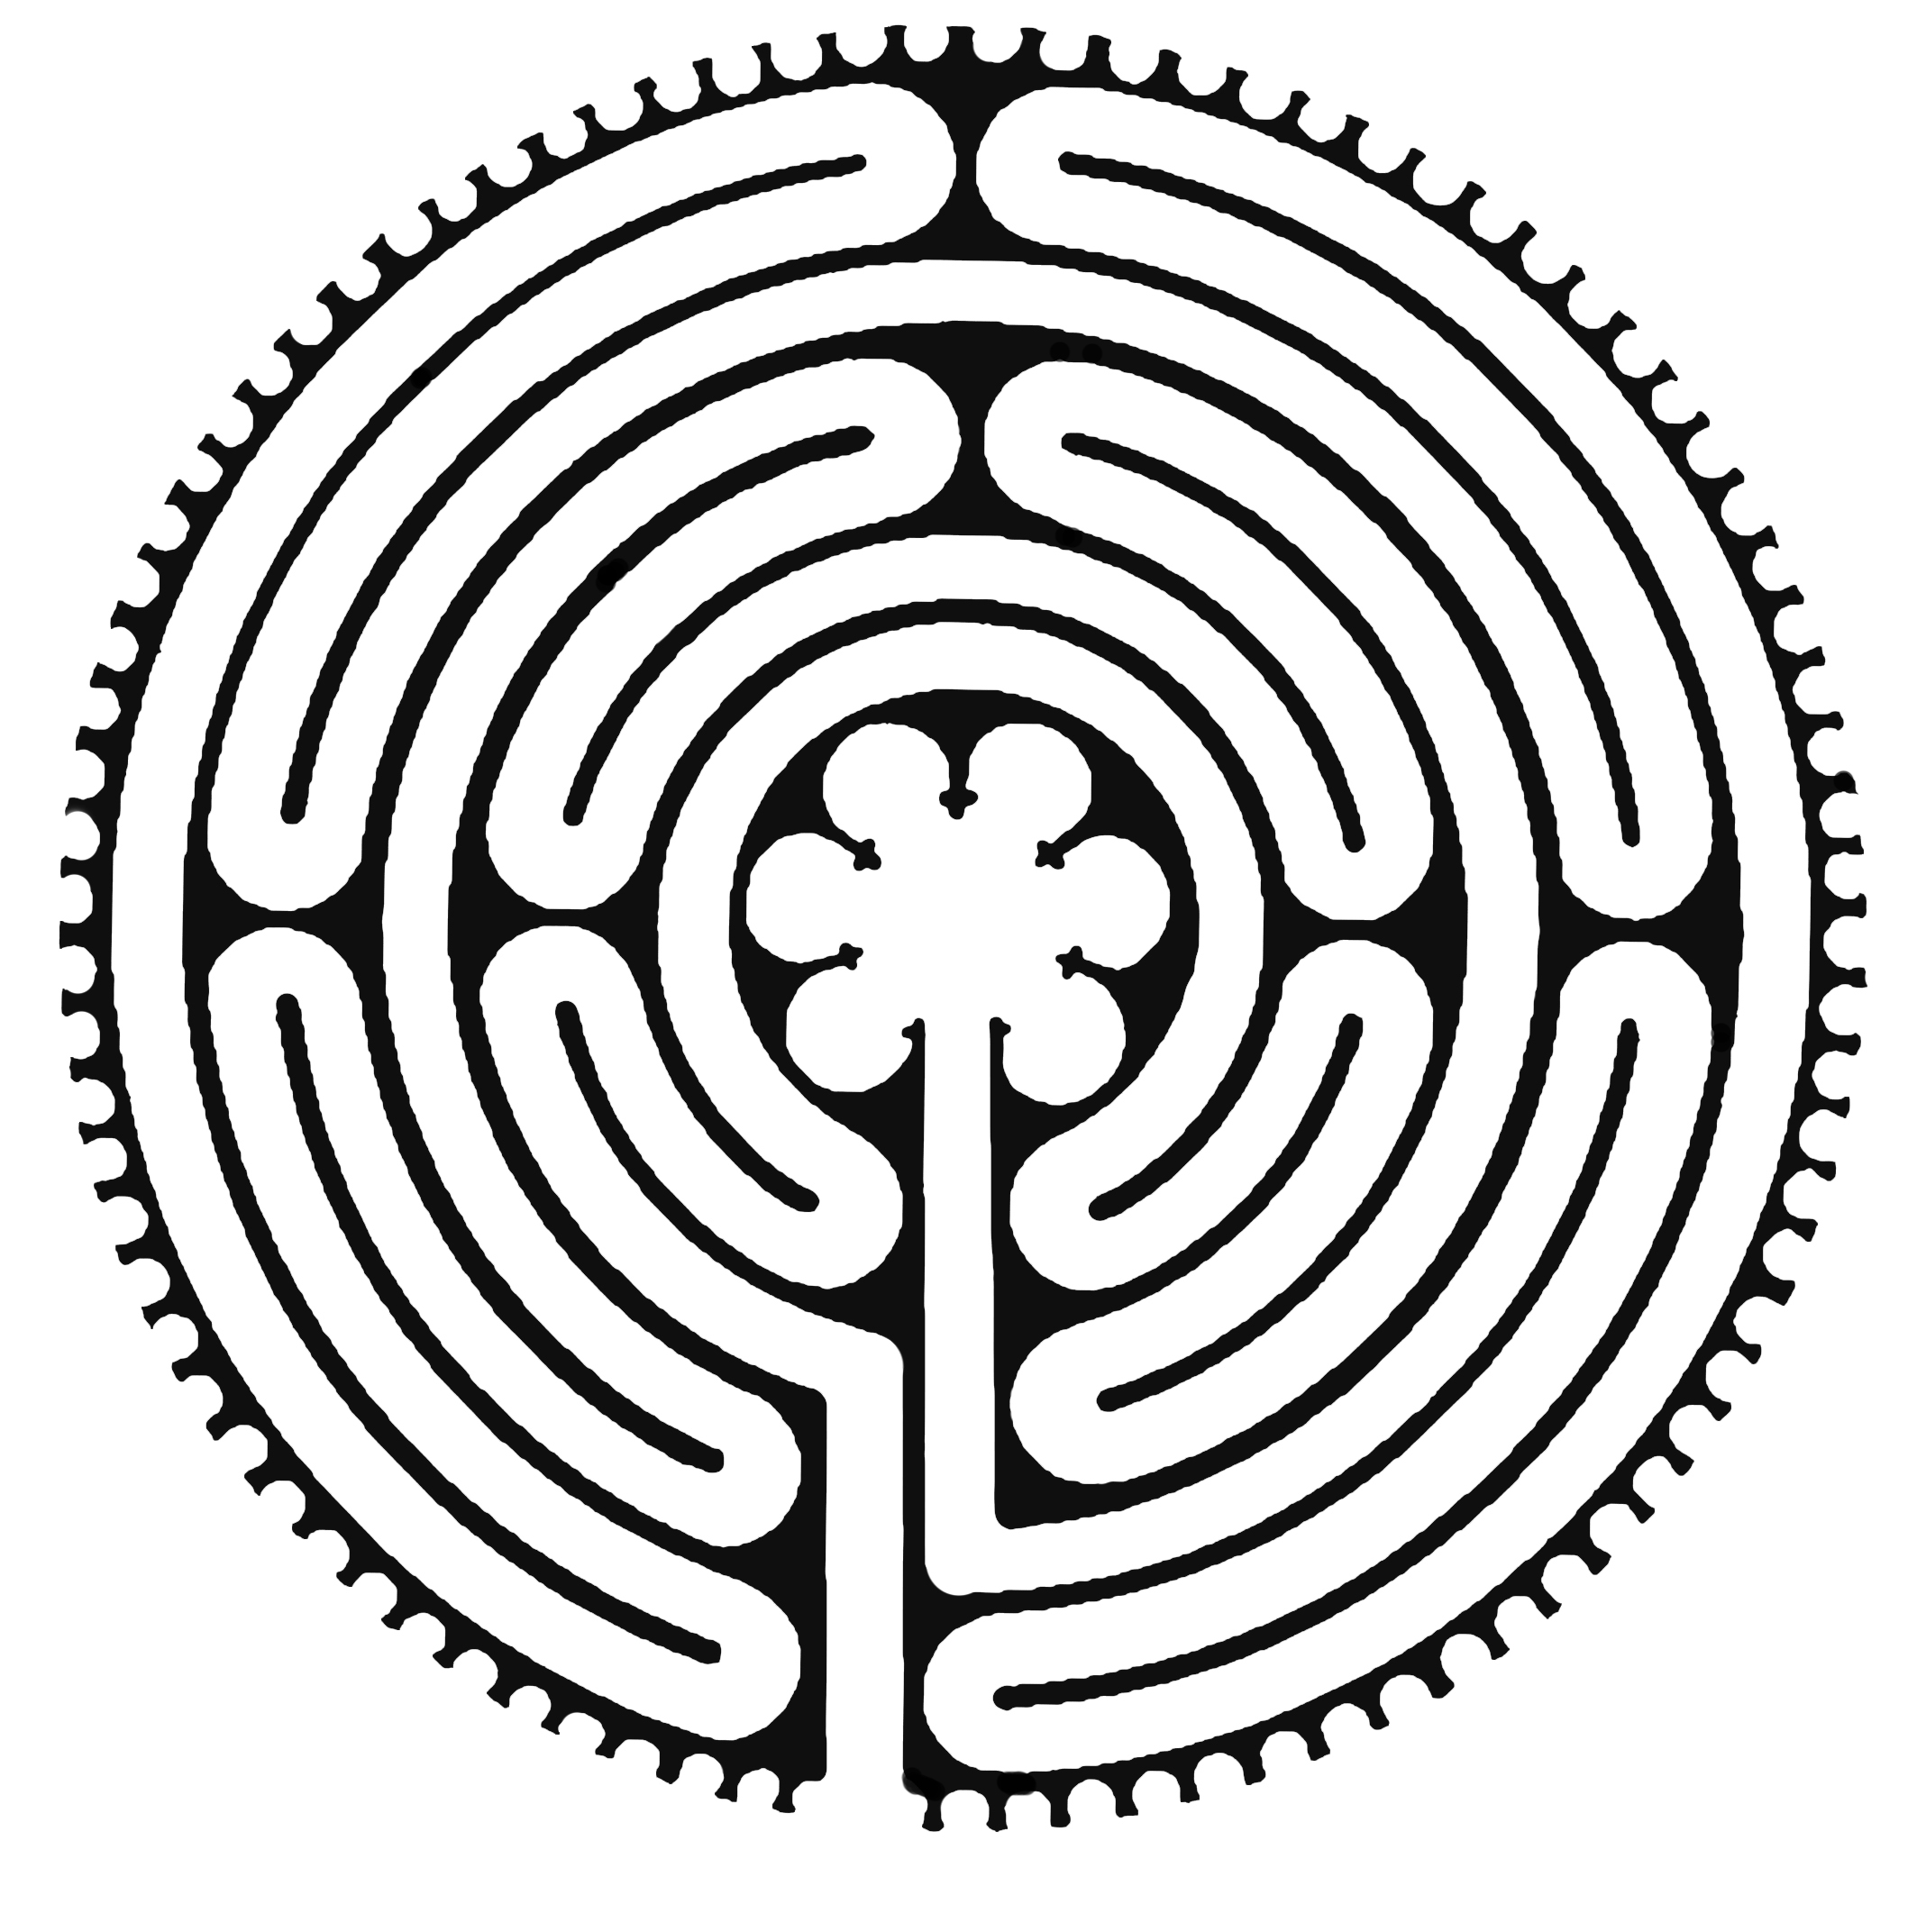 labyrinth services  u2013 baildon methodist church